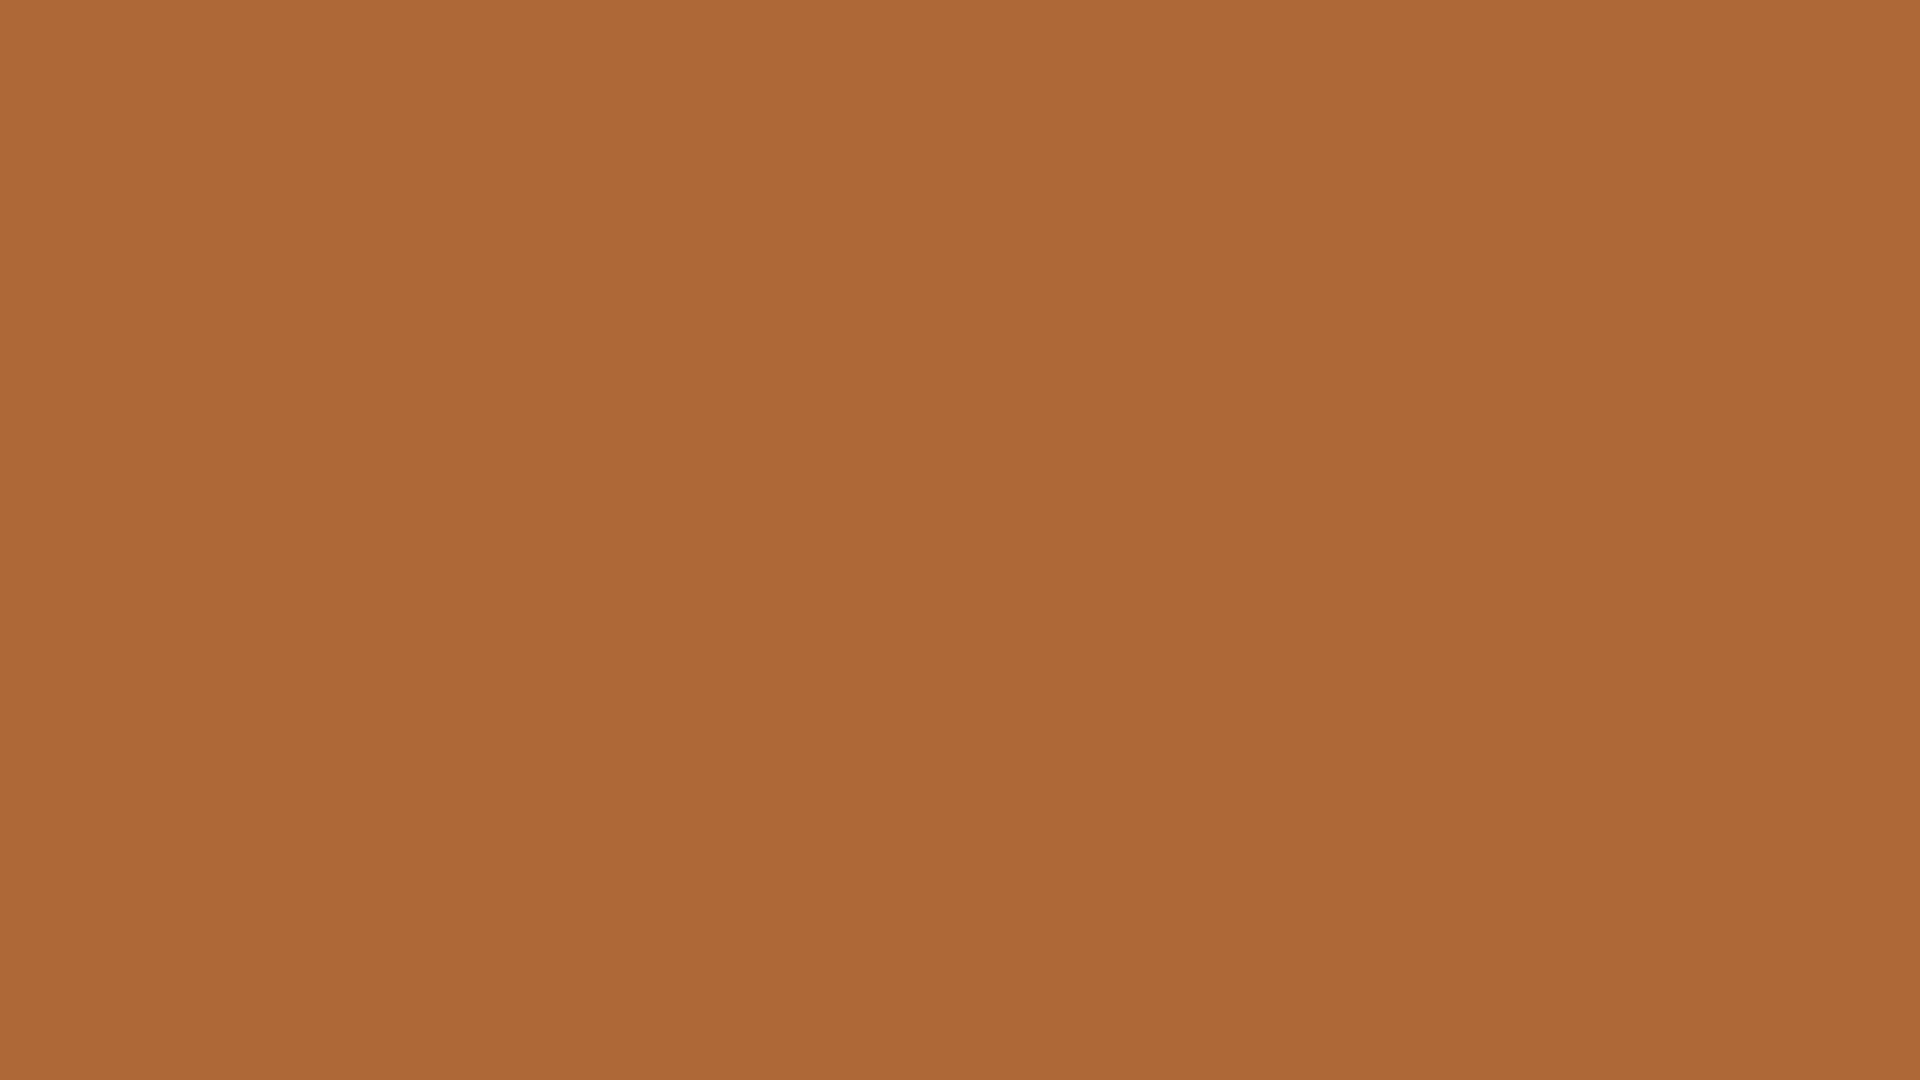 1920x1080 Windsor Tan Solid Color Background